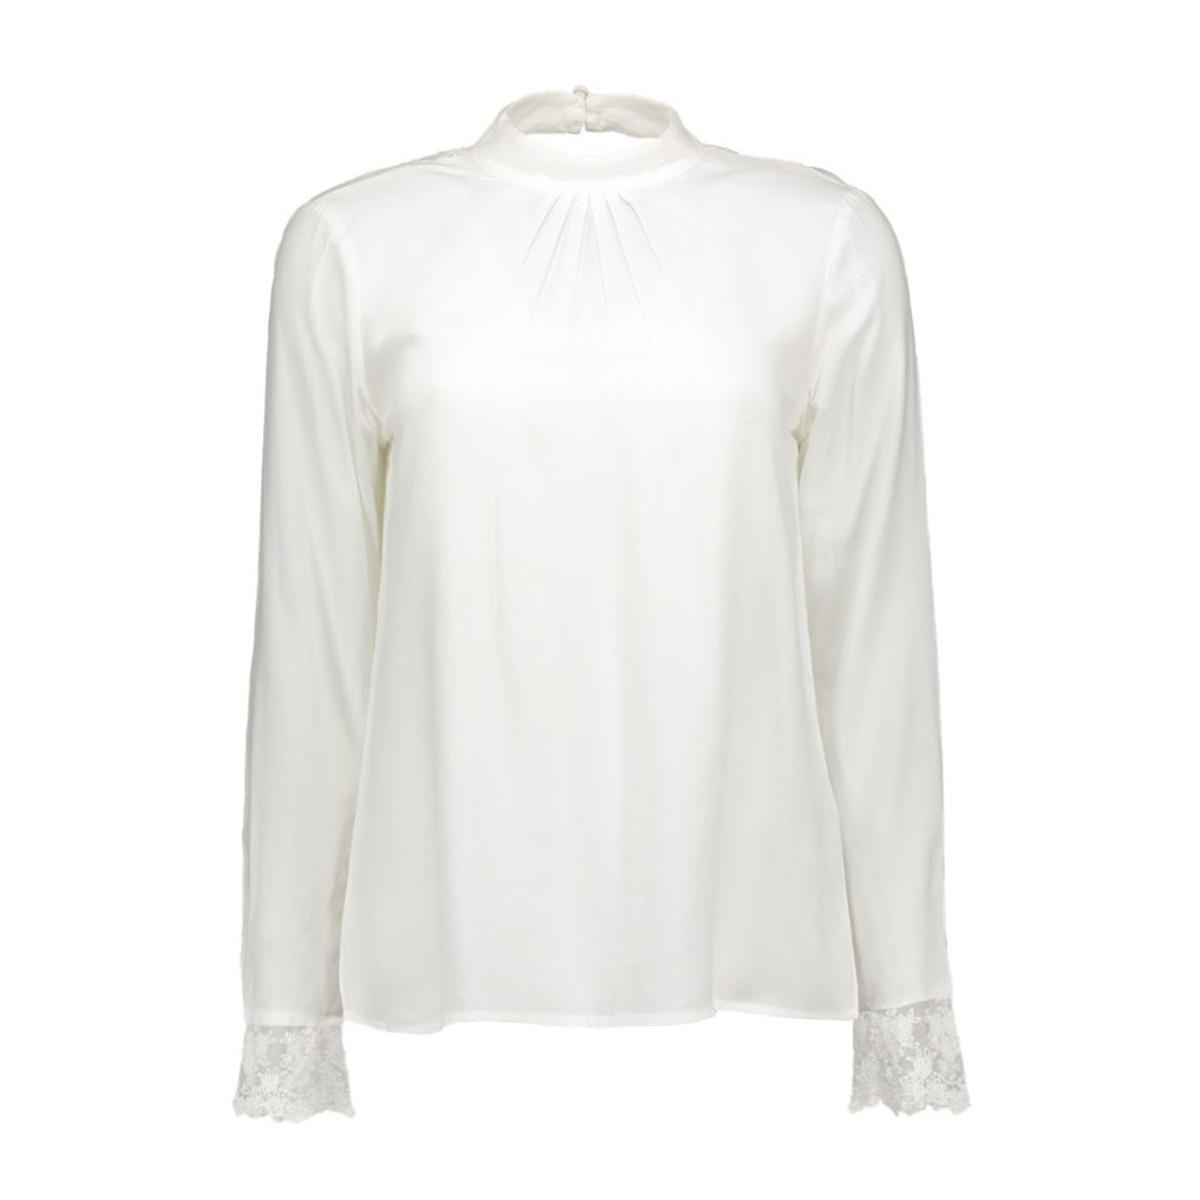 vimeta l/s top 14040191 vila blouse snow white